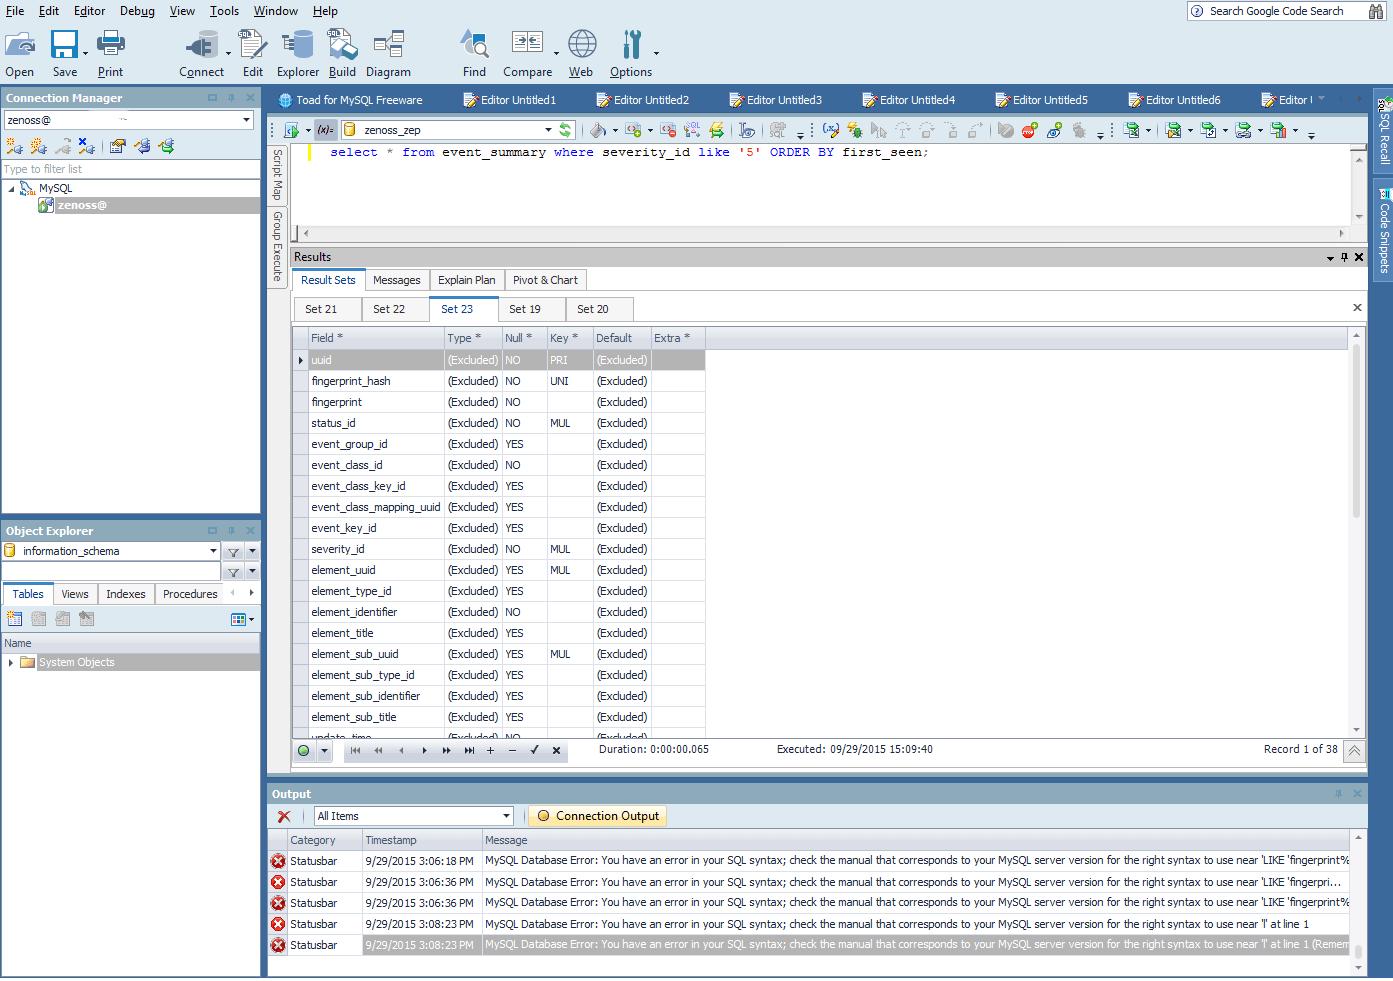 Perf Mon MySQL